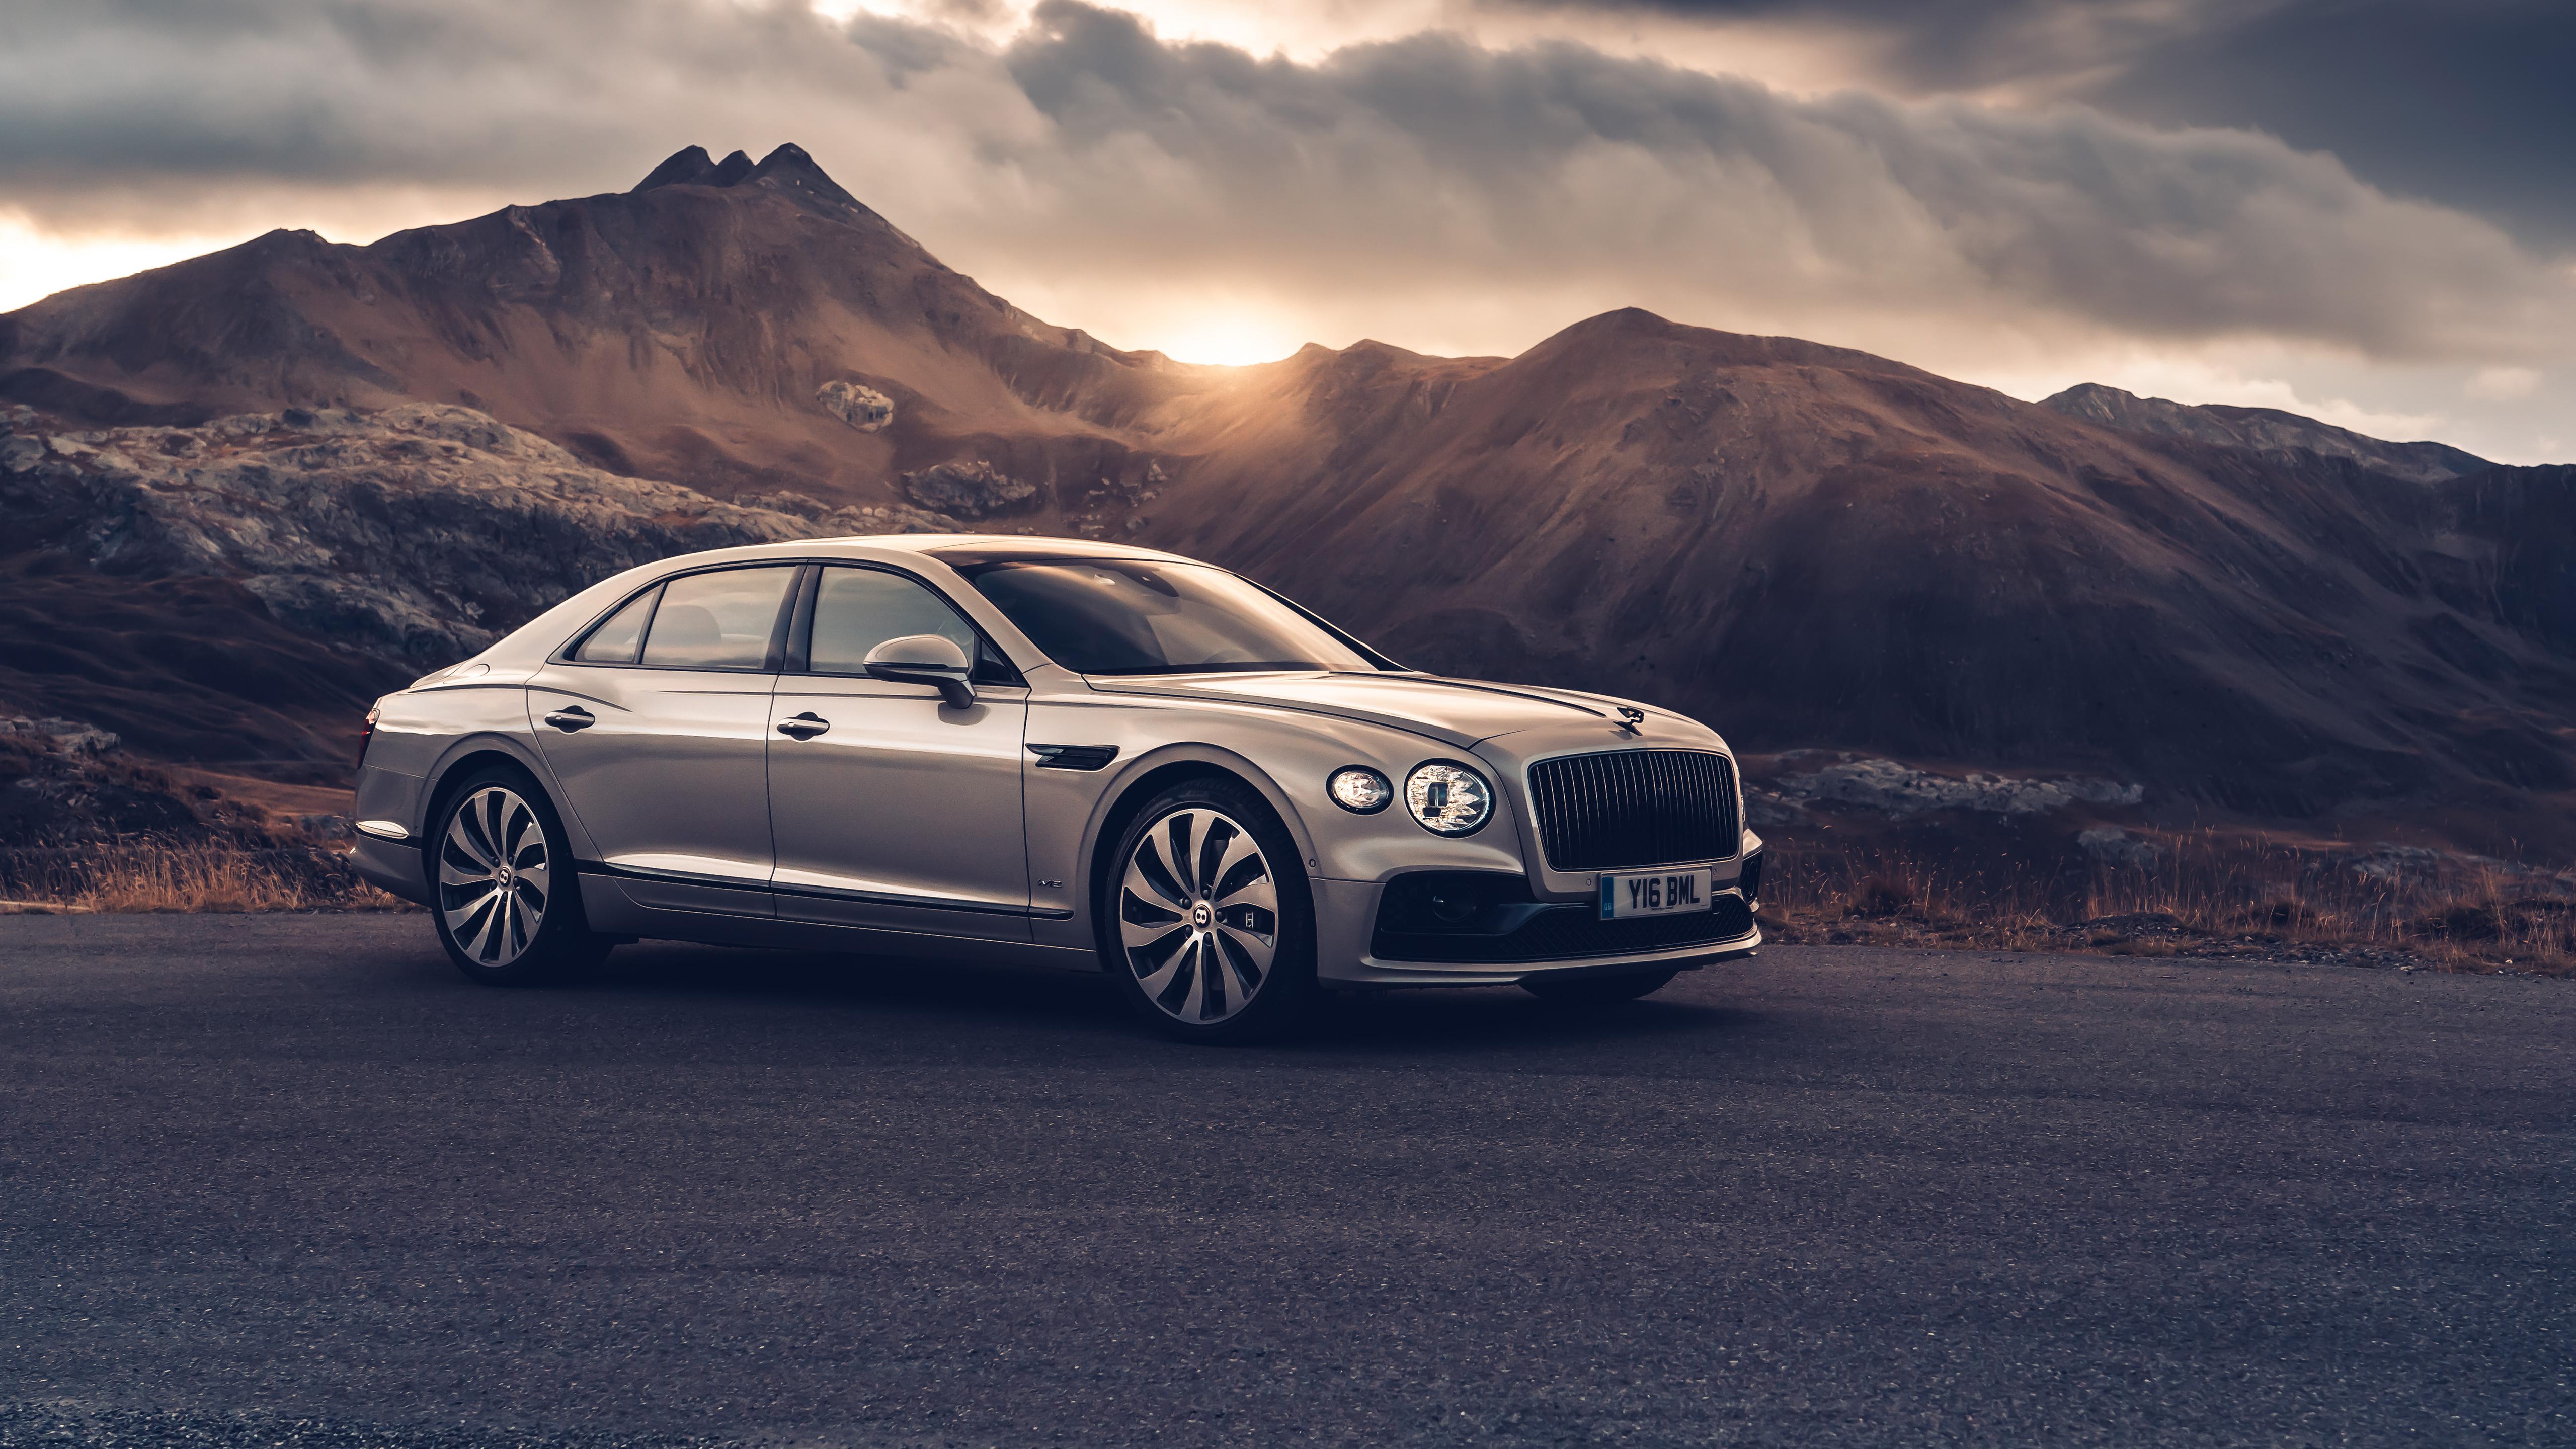 Bentley Flying Spur Blackline 2019 5k 2 Wallpaper Hd Car Wallpapers Id 13536